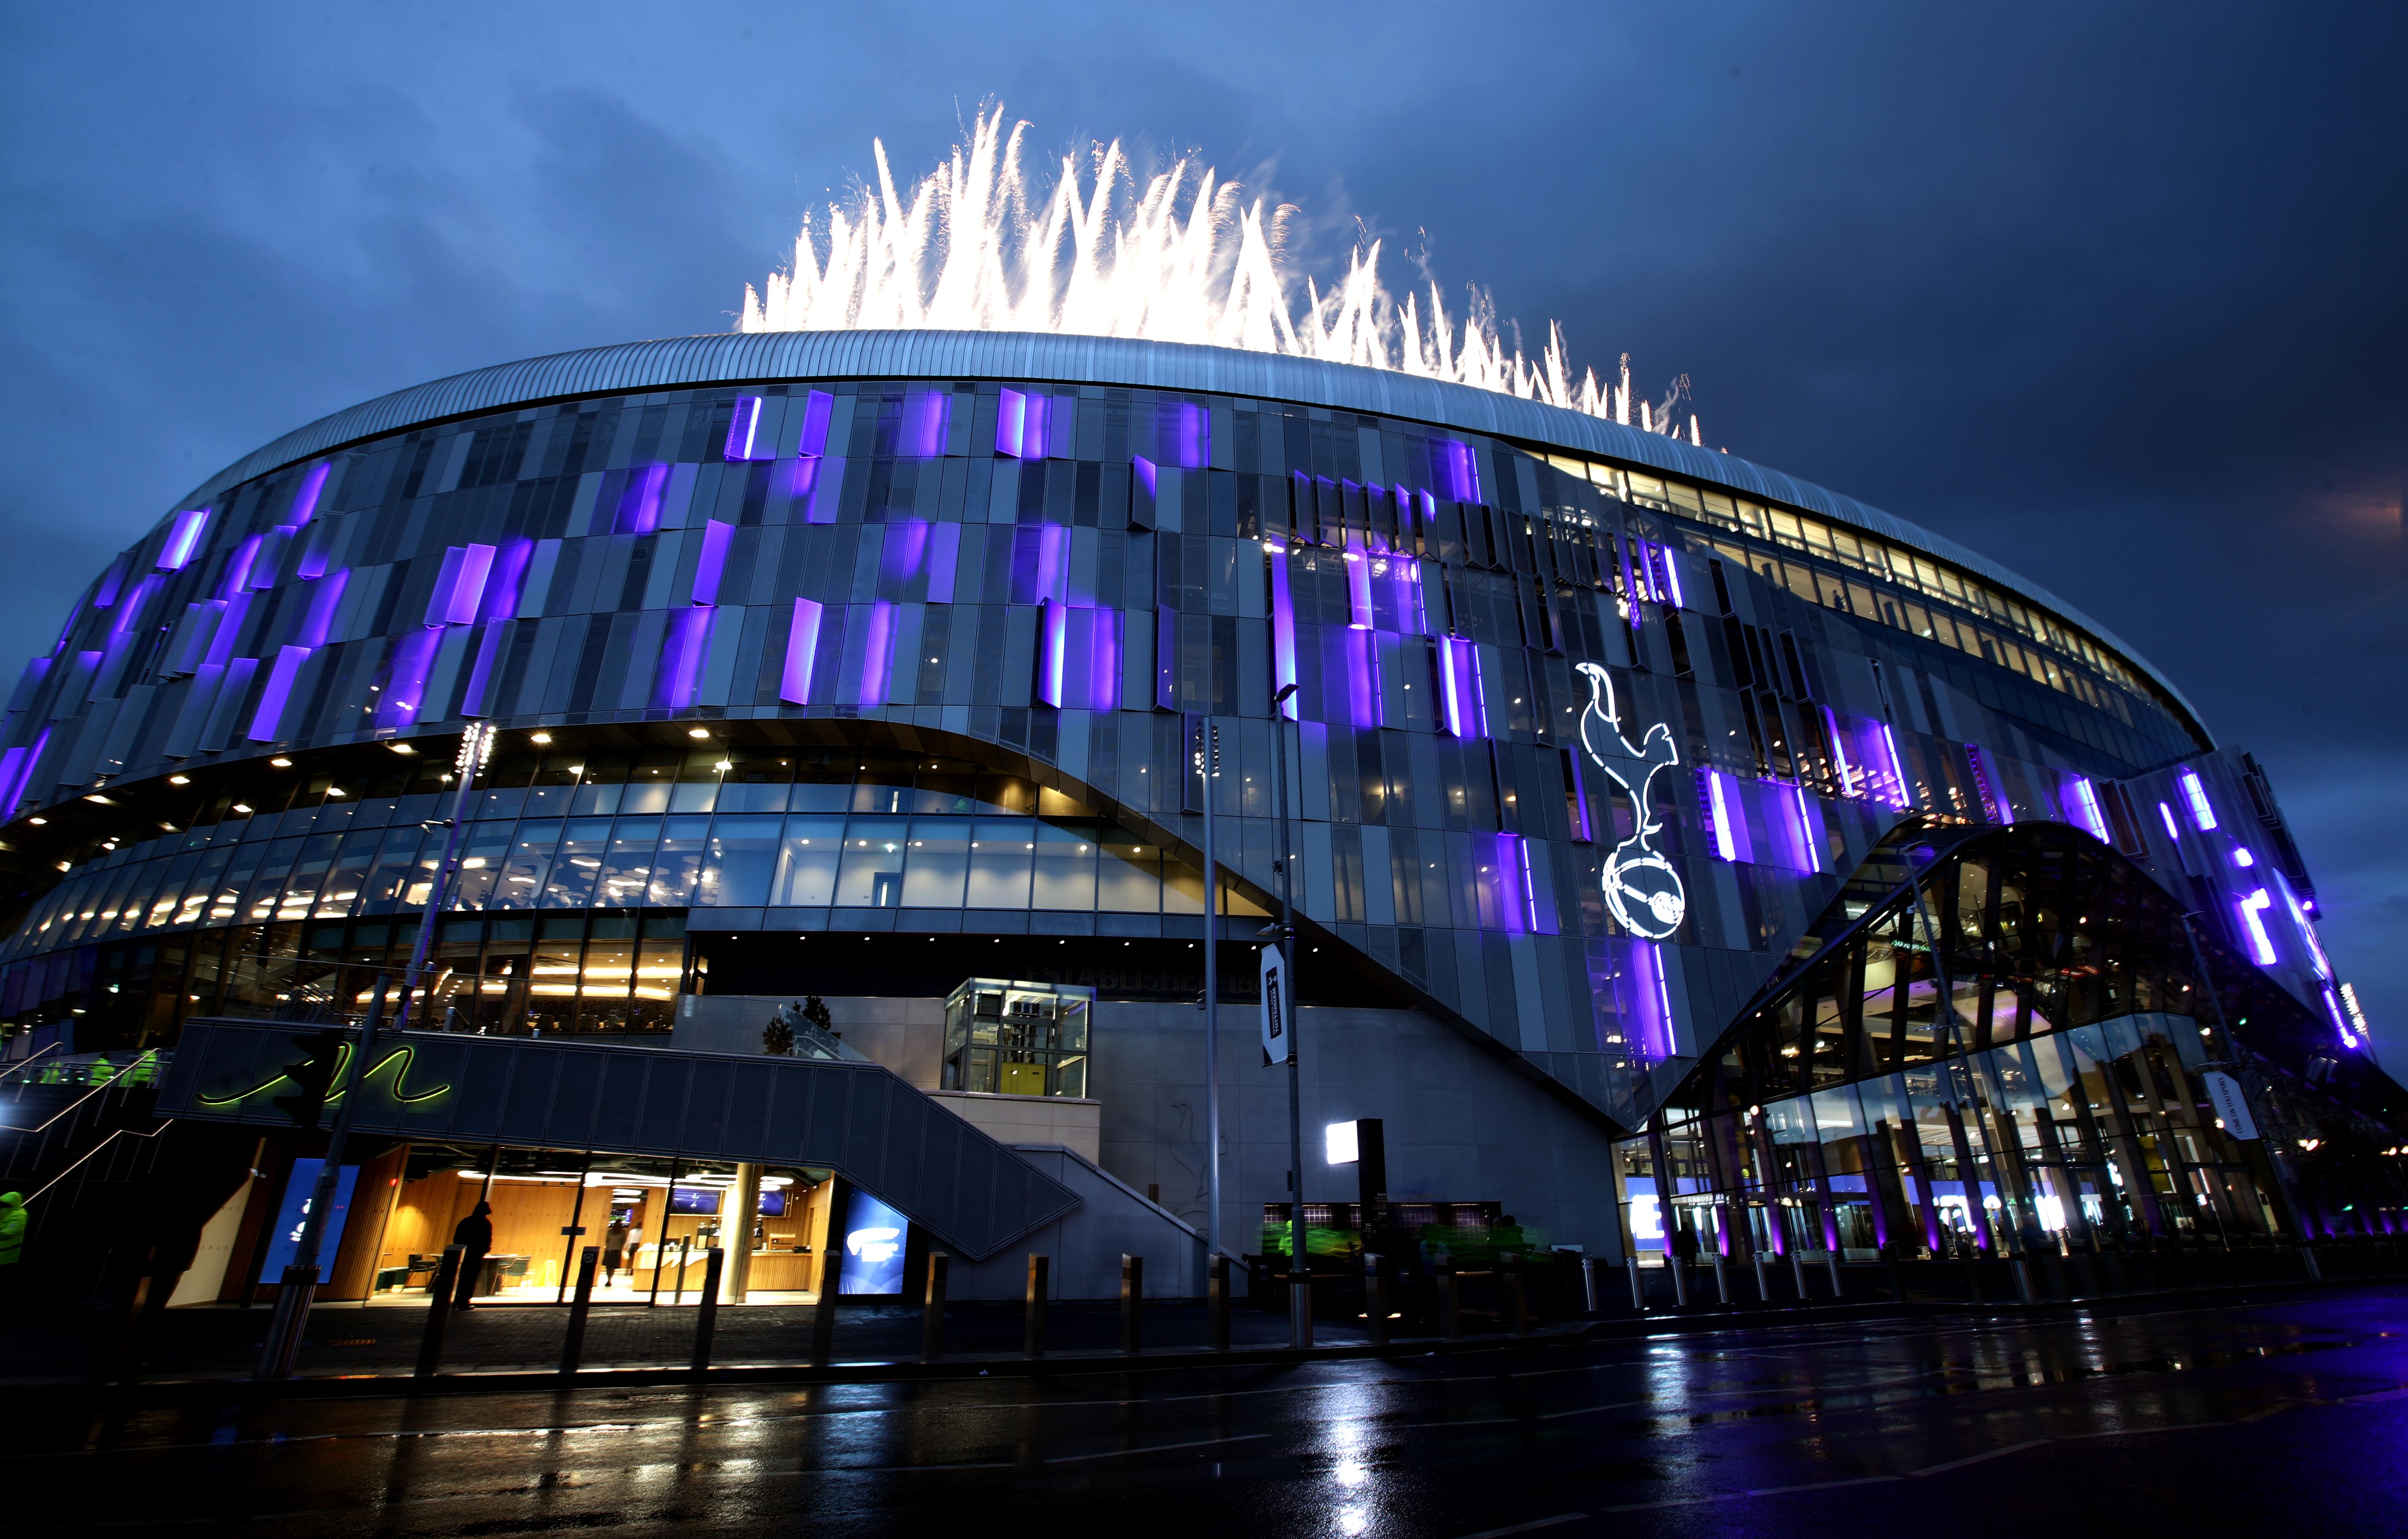 Tottenham Hotspur v Crystal Palace - Premier League - Tottenham Hotspur Stadium